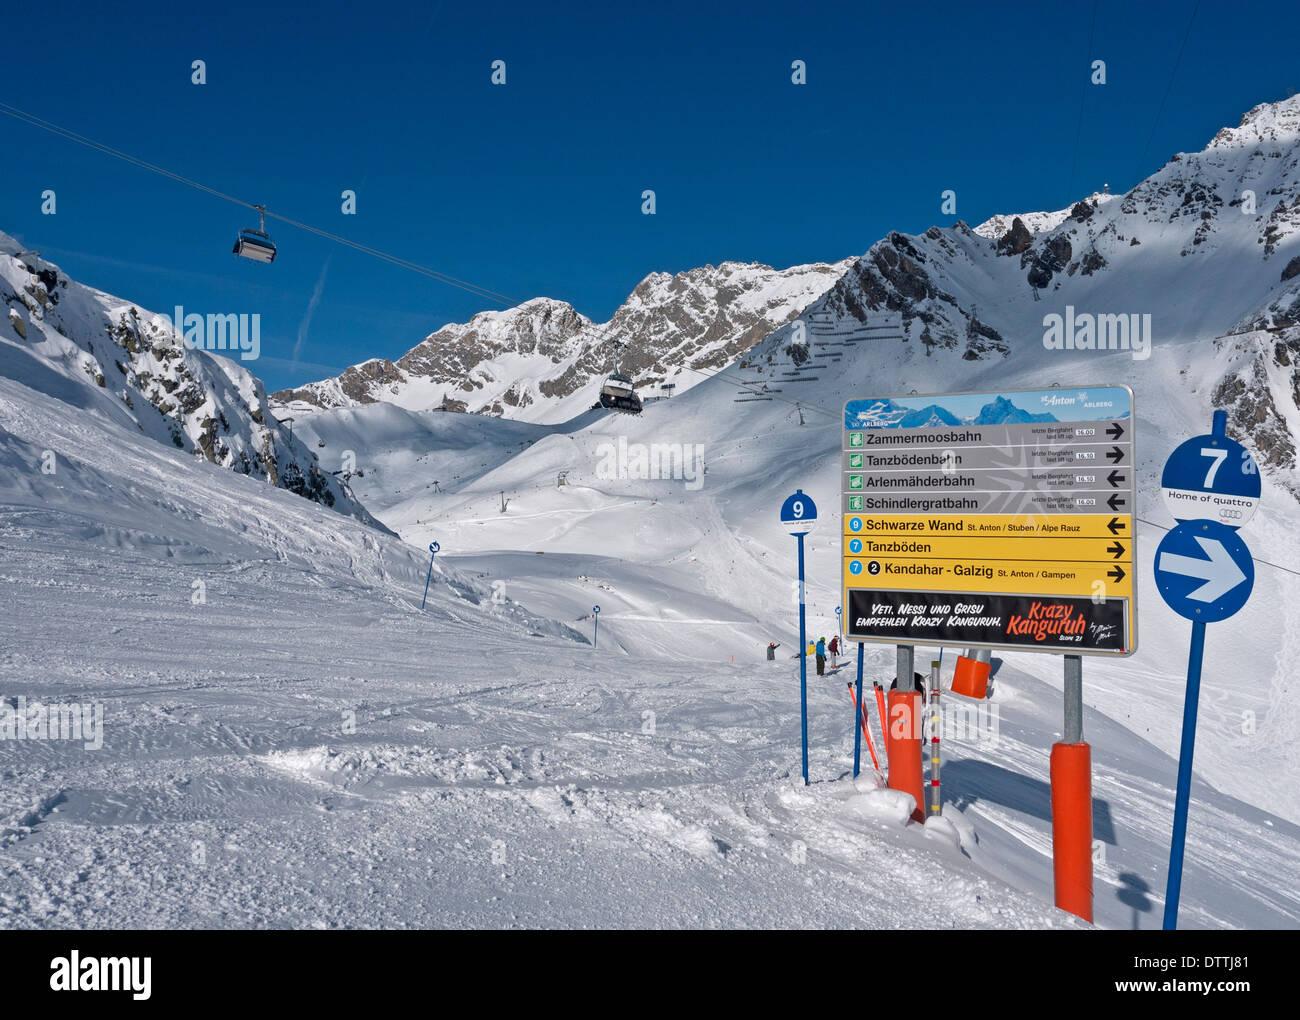 st anton ski resort stock photos & st anton ski resort stock images